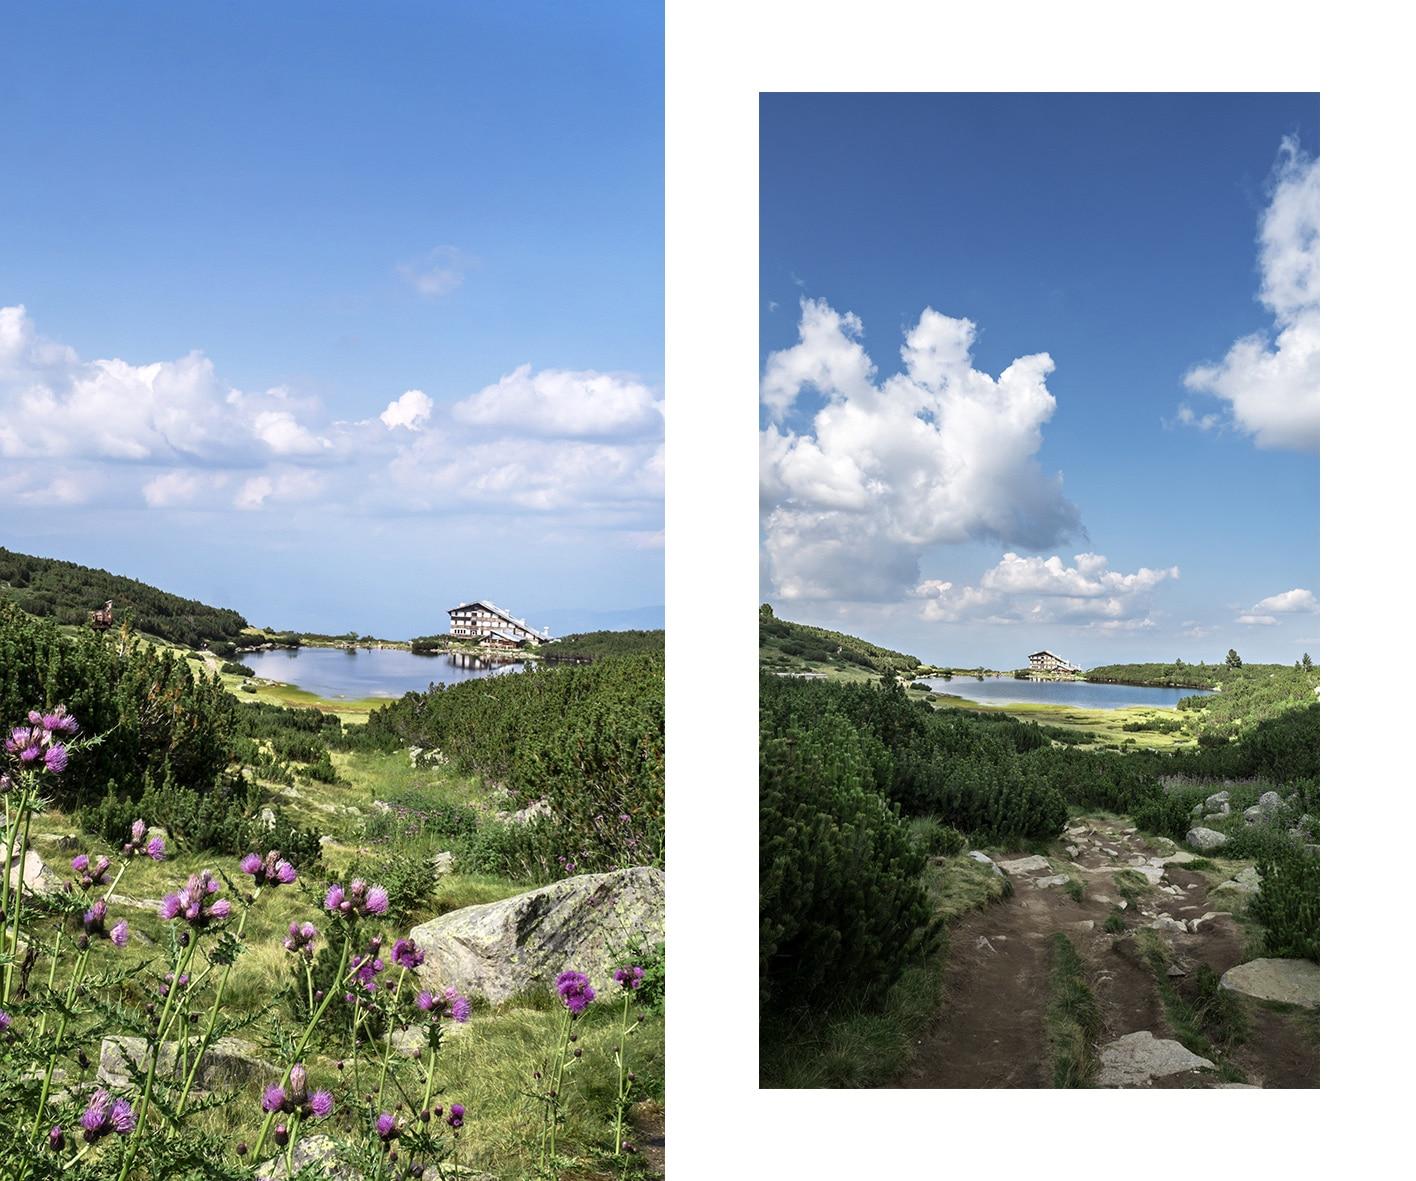 Parc National Pirin